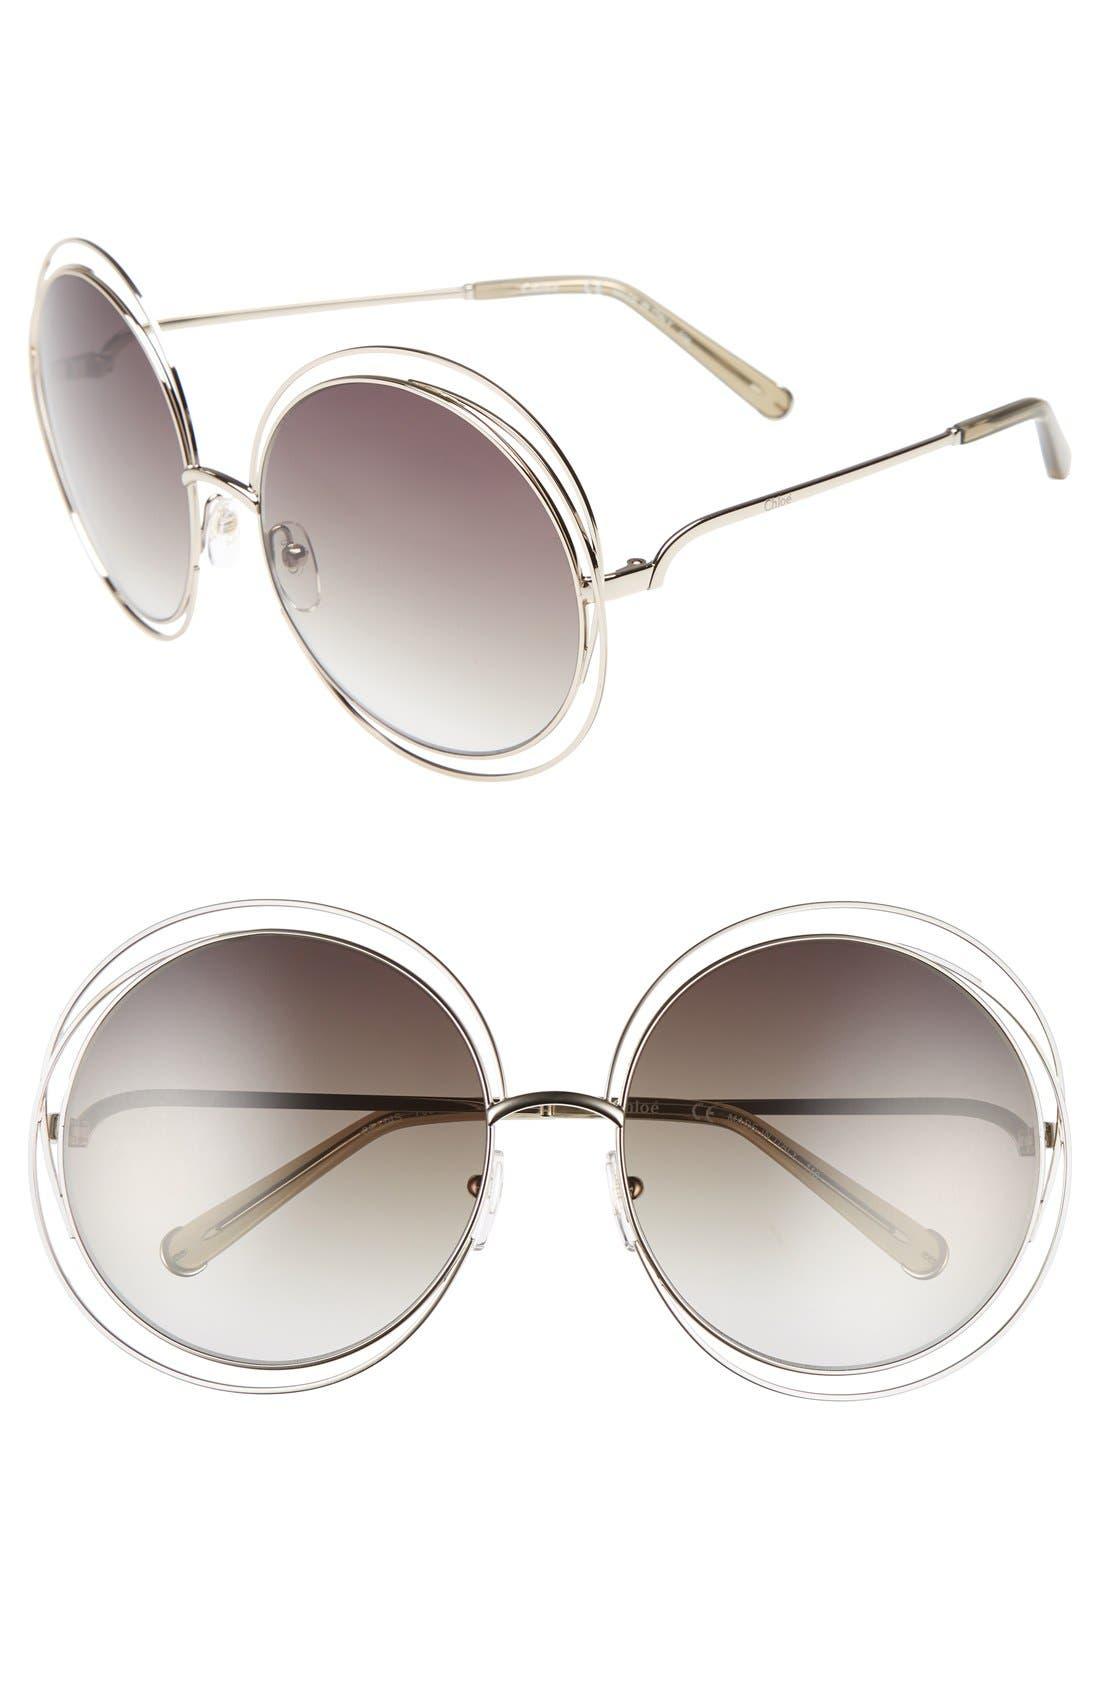 Chloe 62Mm Oversize Sunglasses -